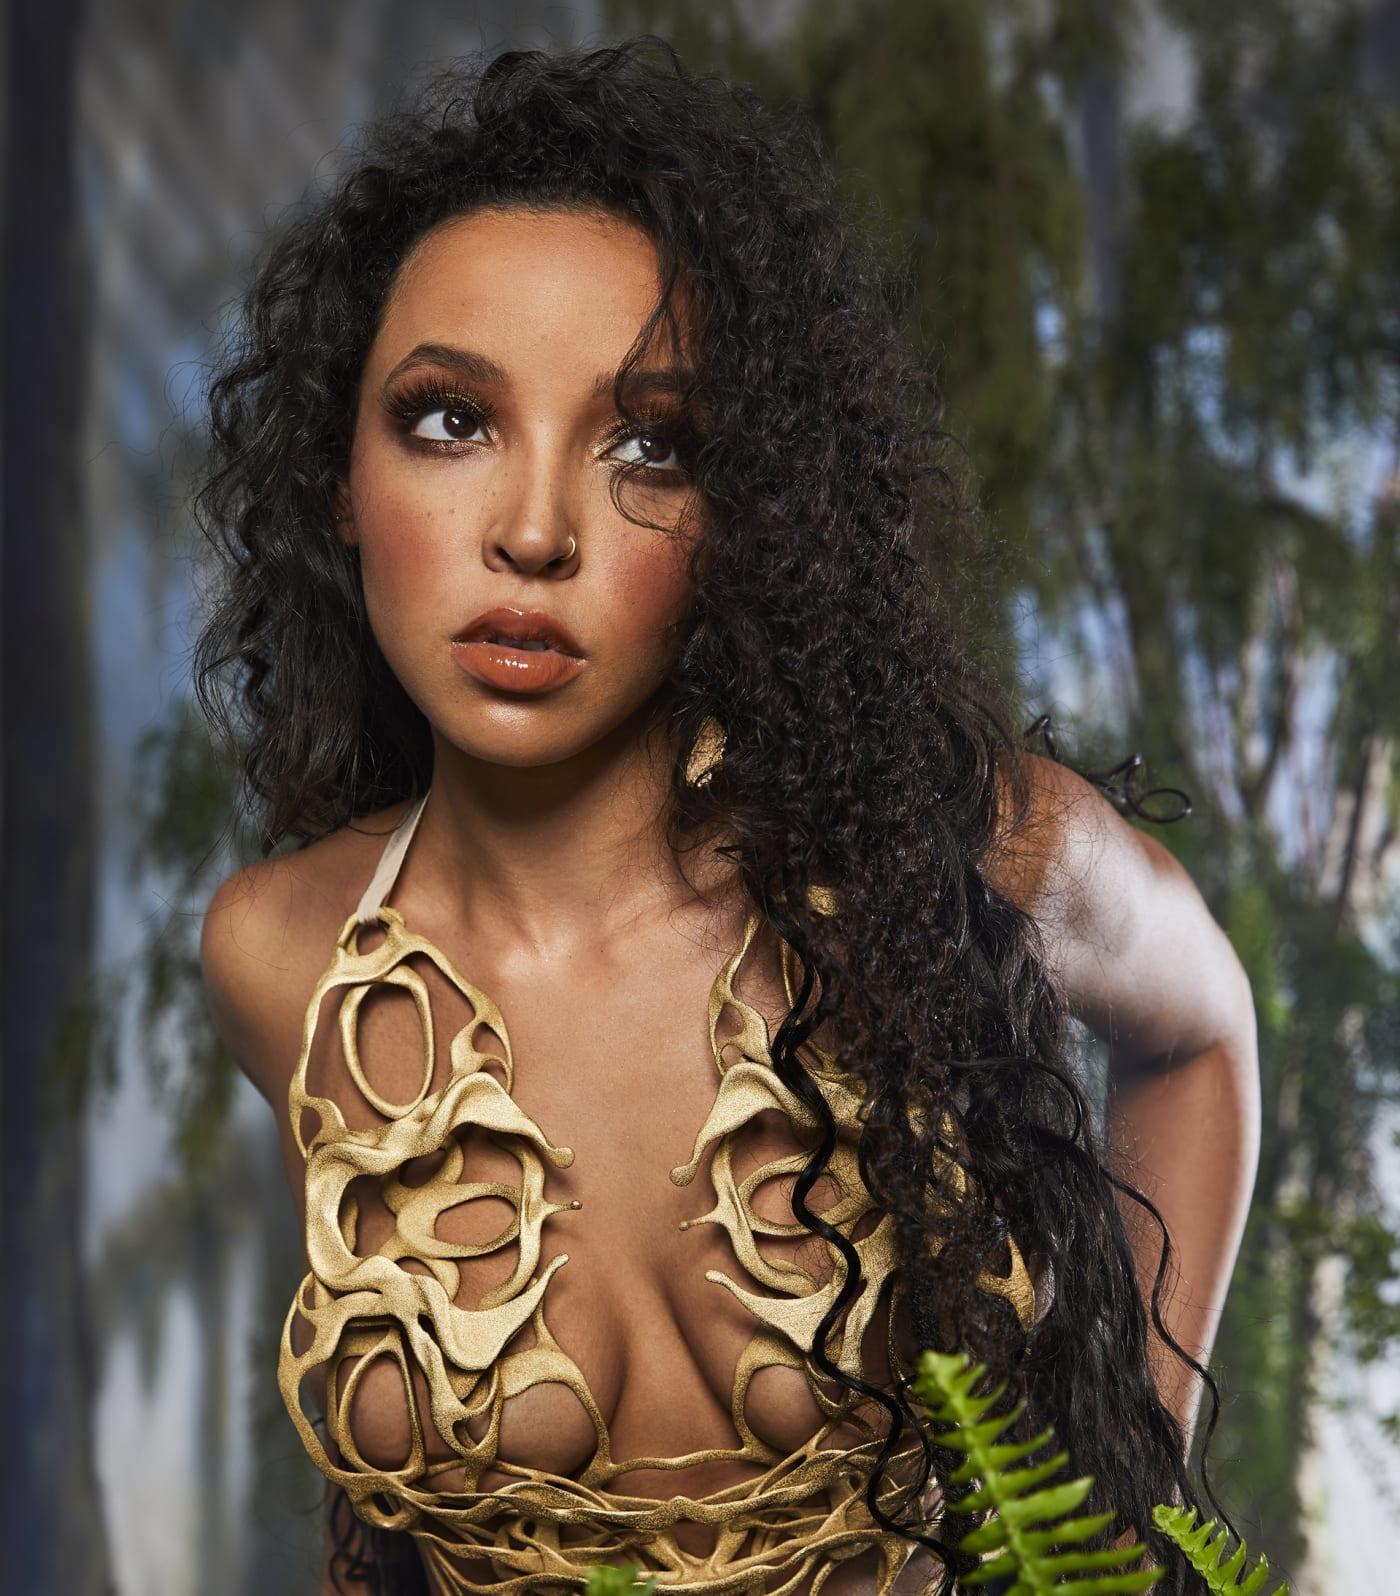 Tinashe press photo '333' album